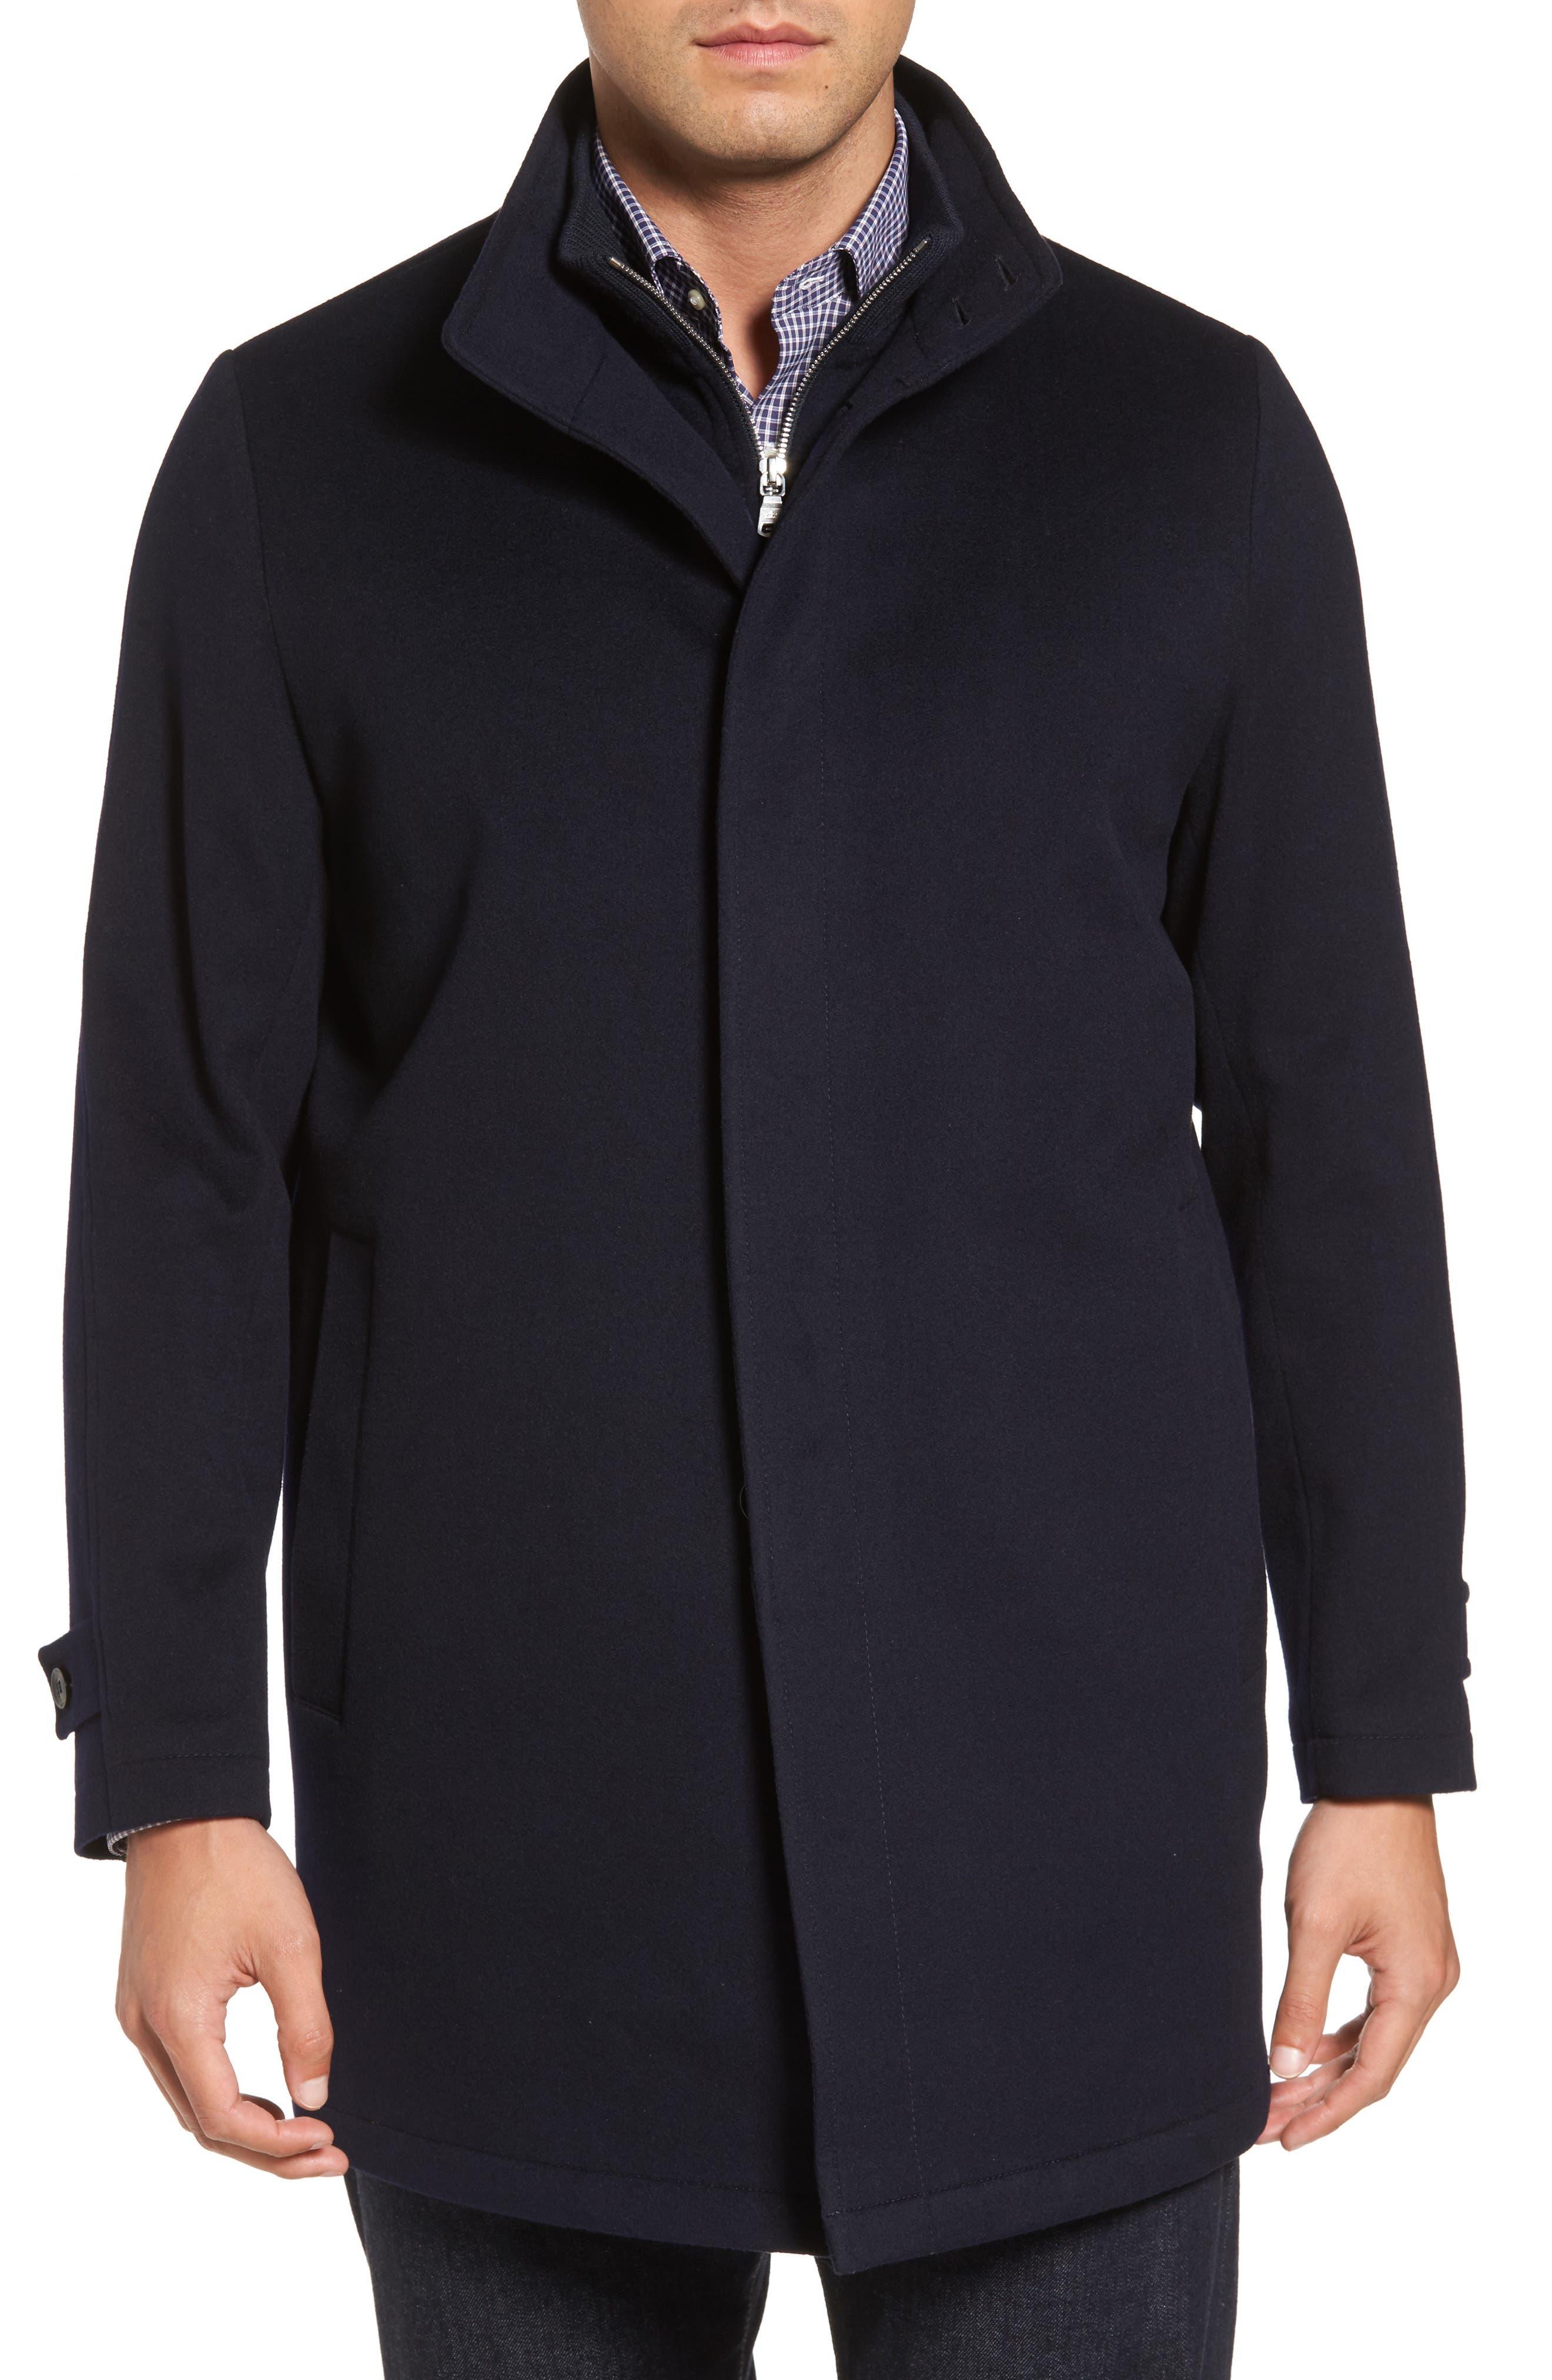 Peter Millar Horizon Wool Overcoat,                             Alternate thumbnail 2, color,                             Black